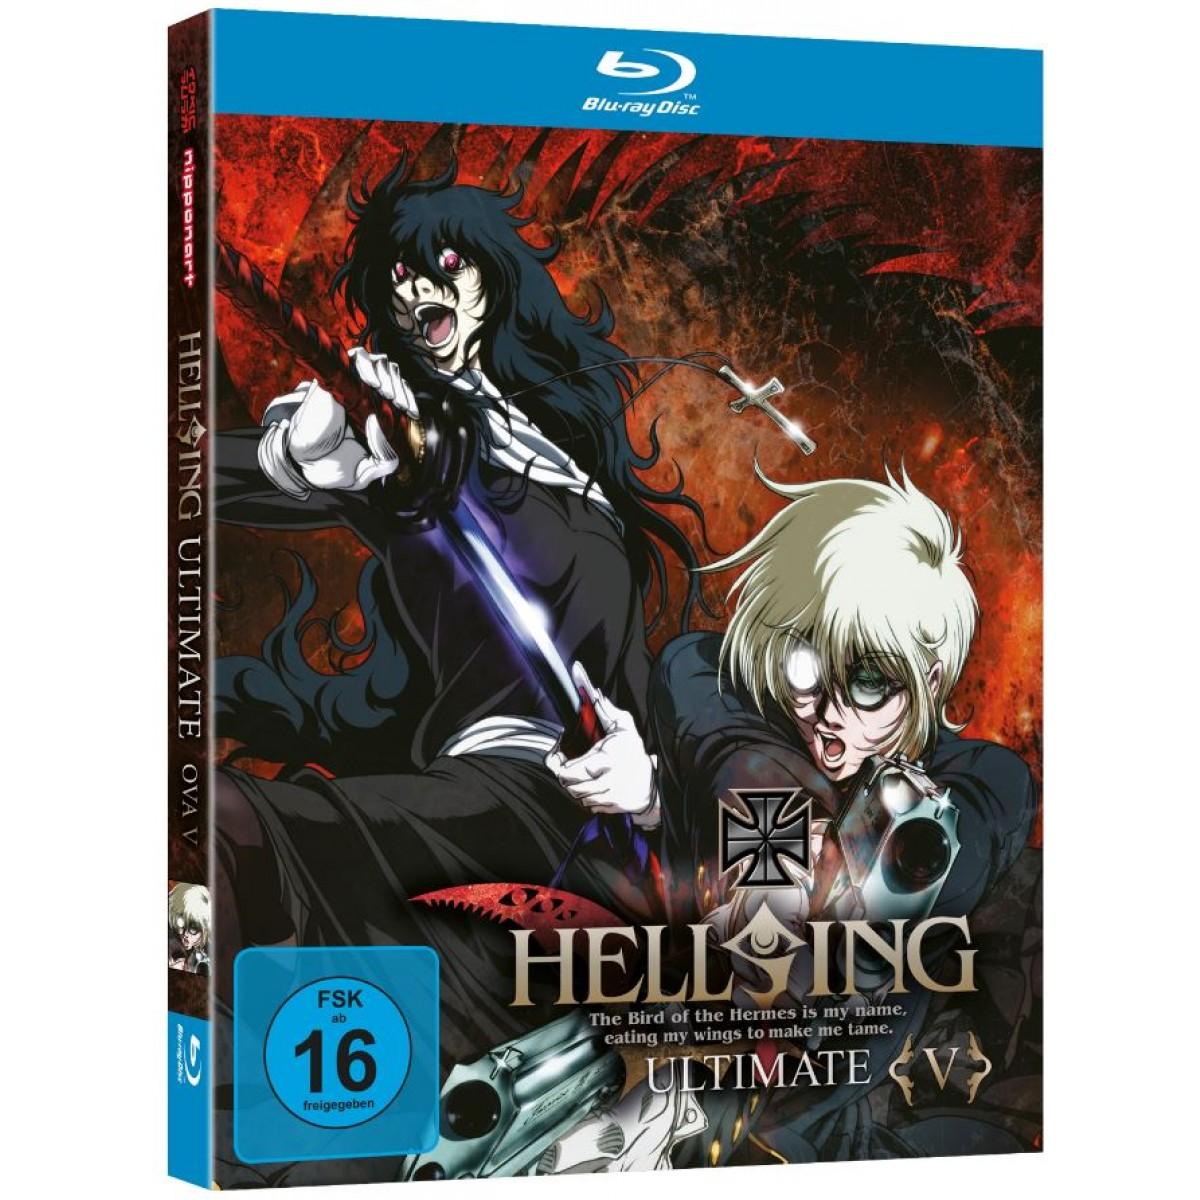 Hellsing Ultimate OVA Vol 5 Blu Ray Edition Optional Mit